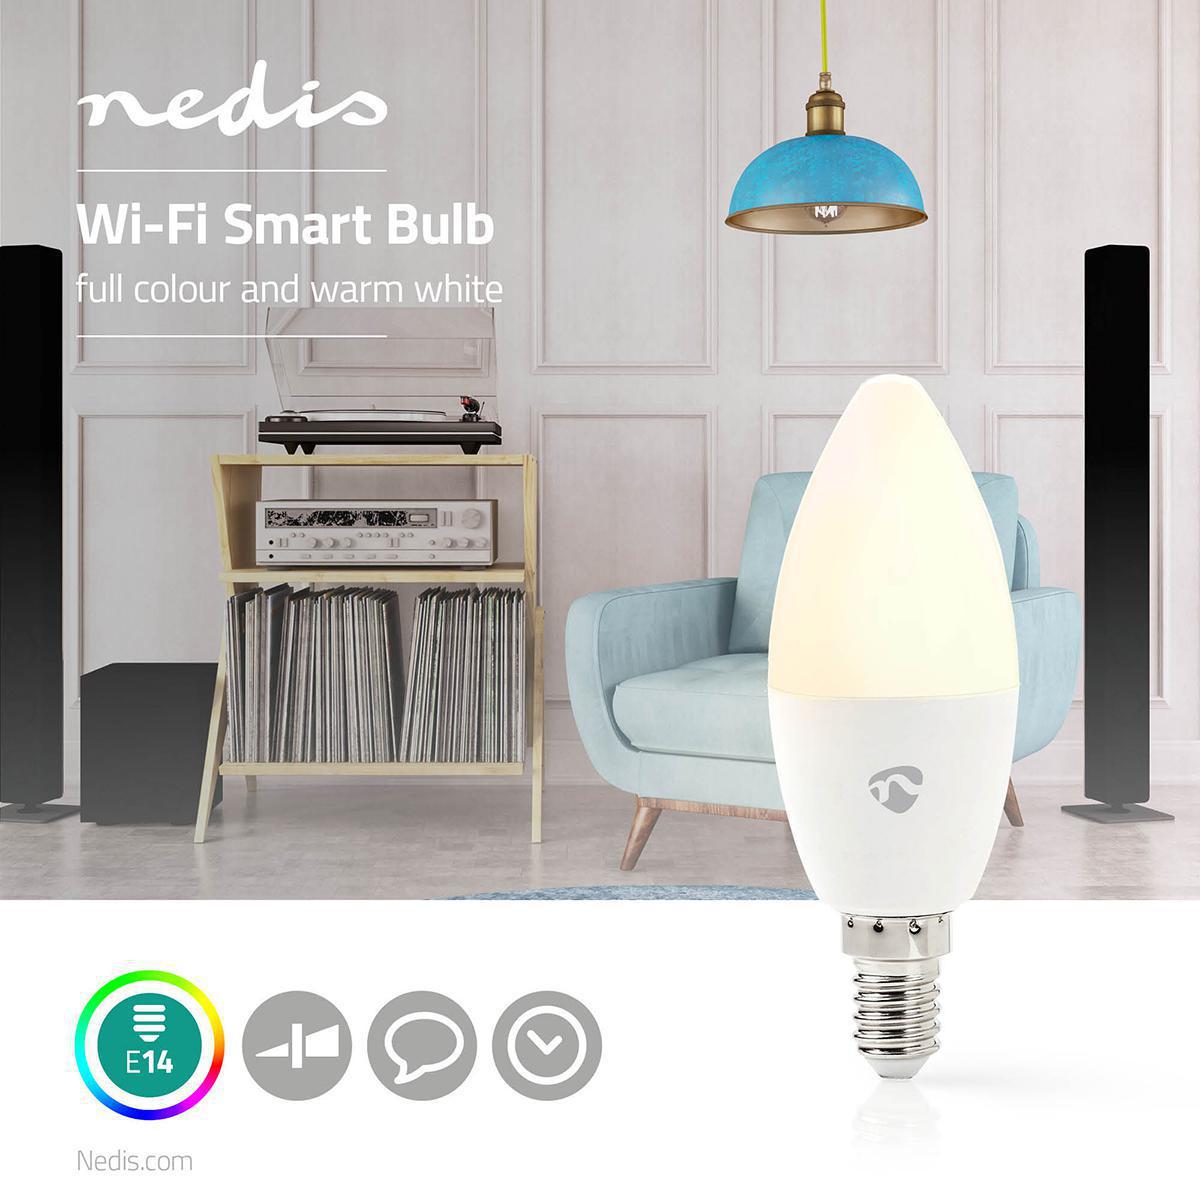 Slimme Led Lamp Wi-Fi - RGB en warm wit E14 - sfeerfoto